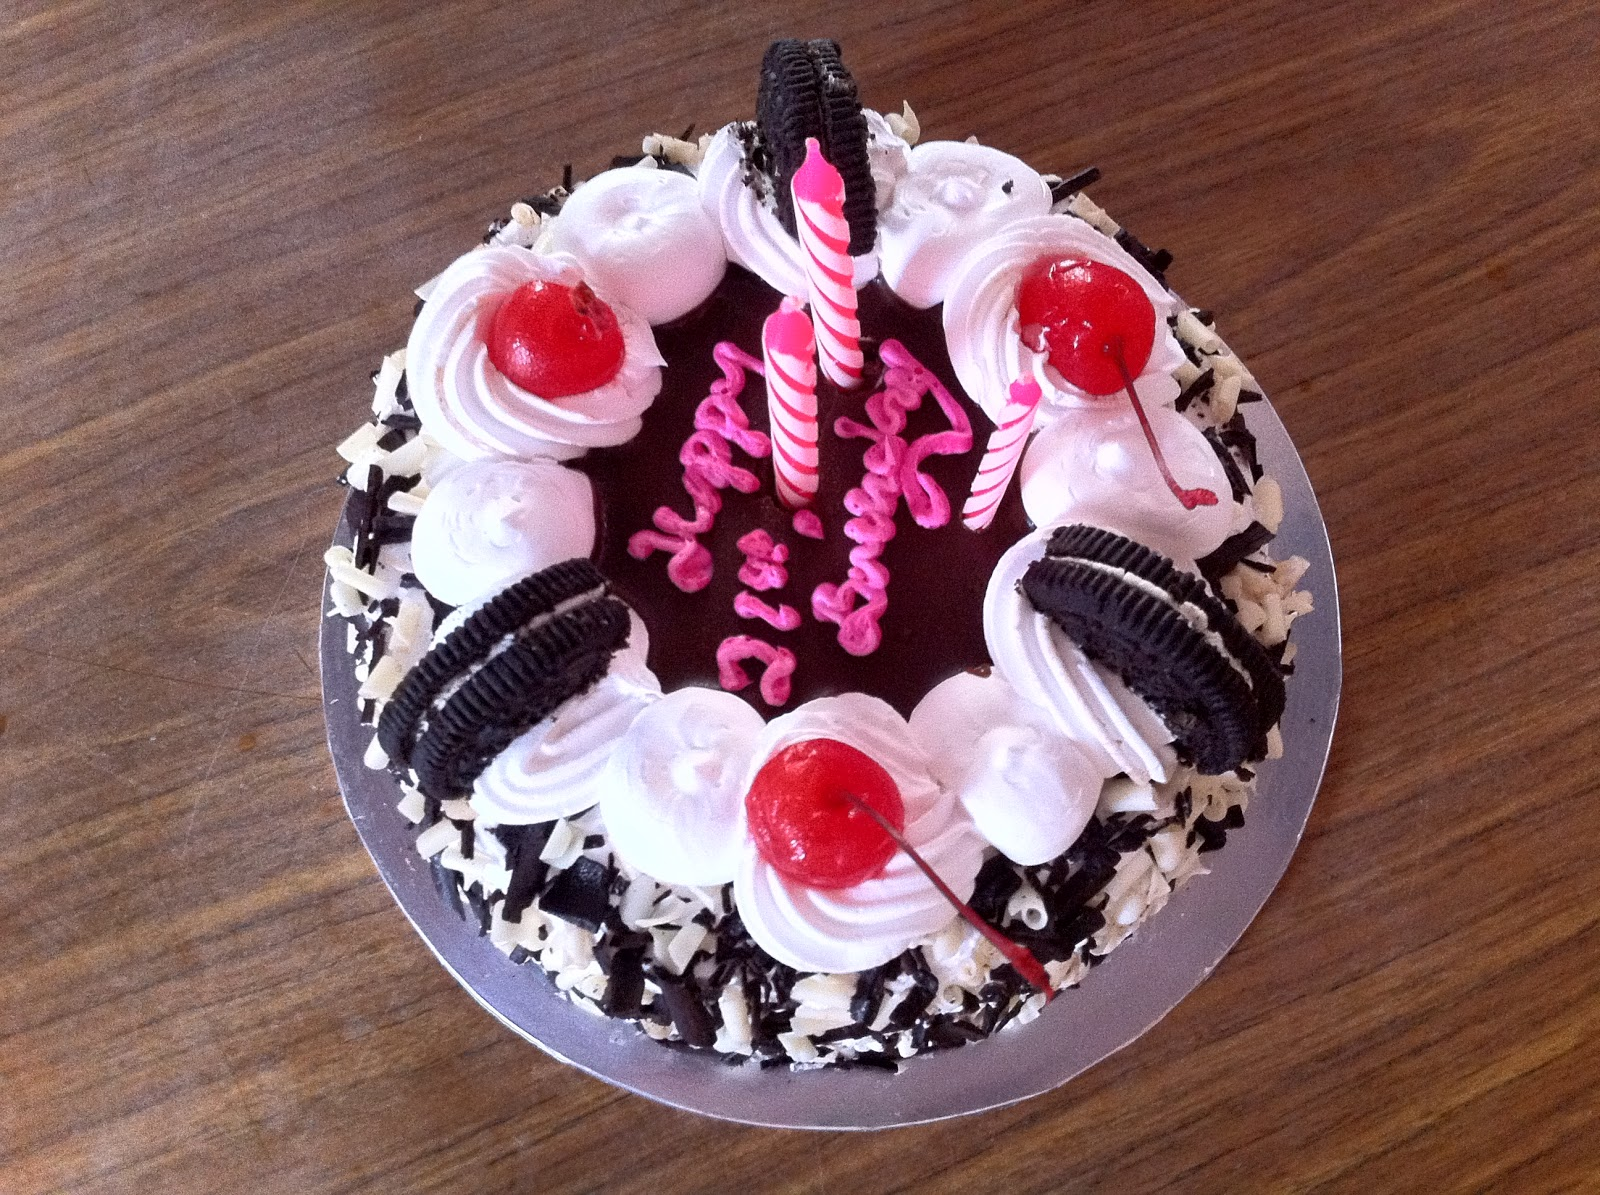 Dairy Queen Birthday Cake Oreo Blizzard Calories Birthday Cake